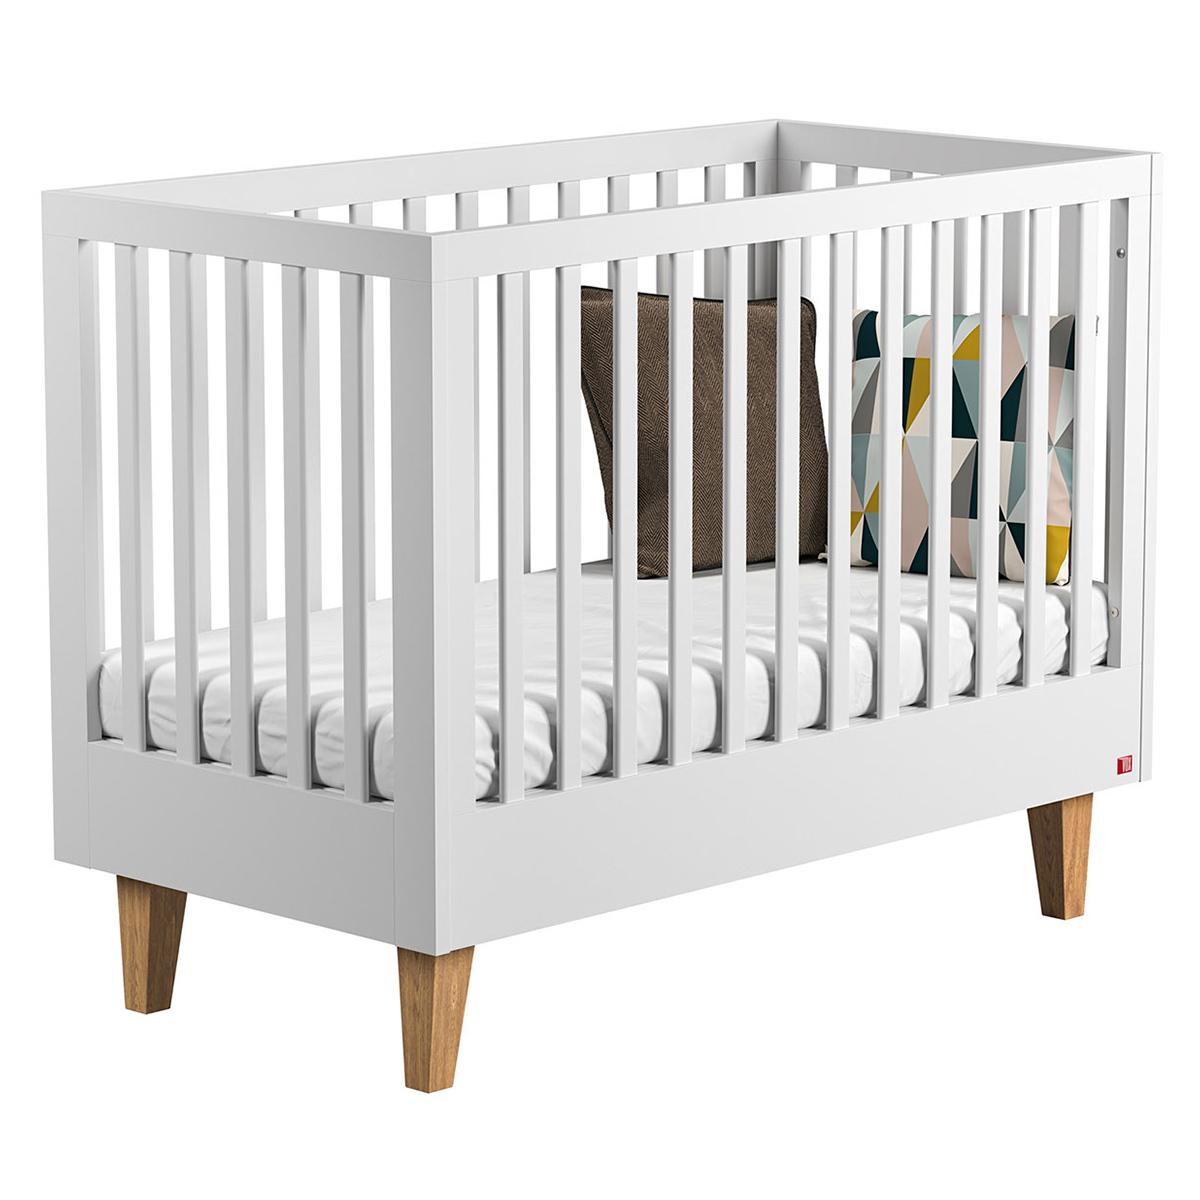 Lit bébé Lit Bébé Evolutif Lounge 70 x 140 cm - Blanc